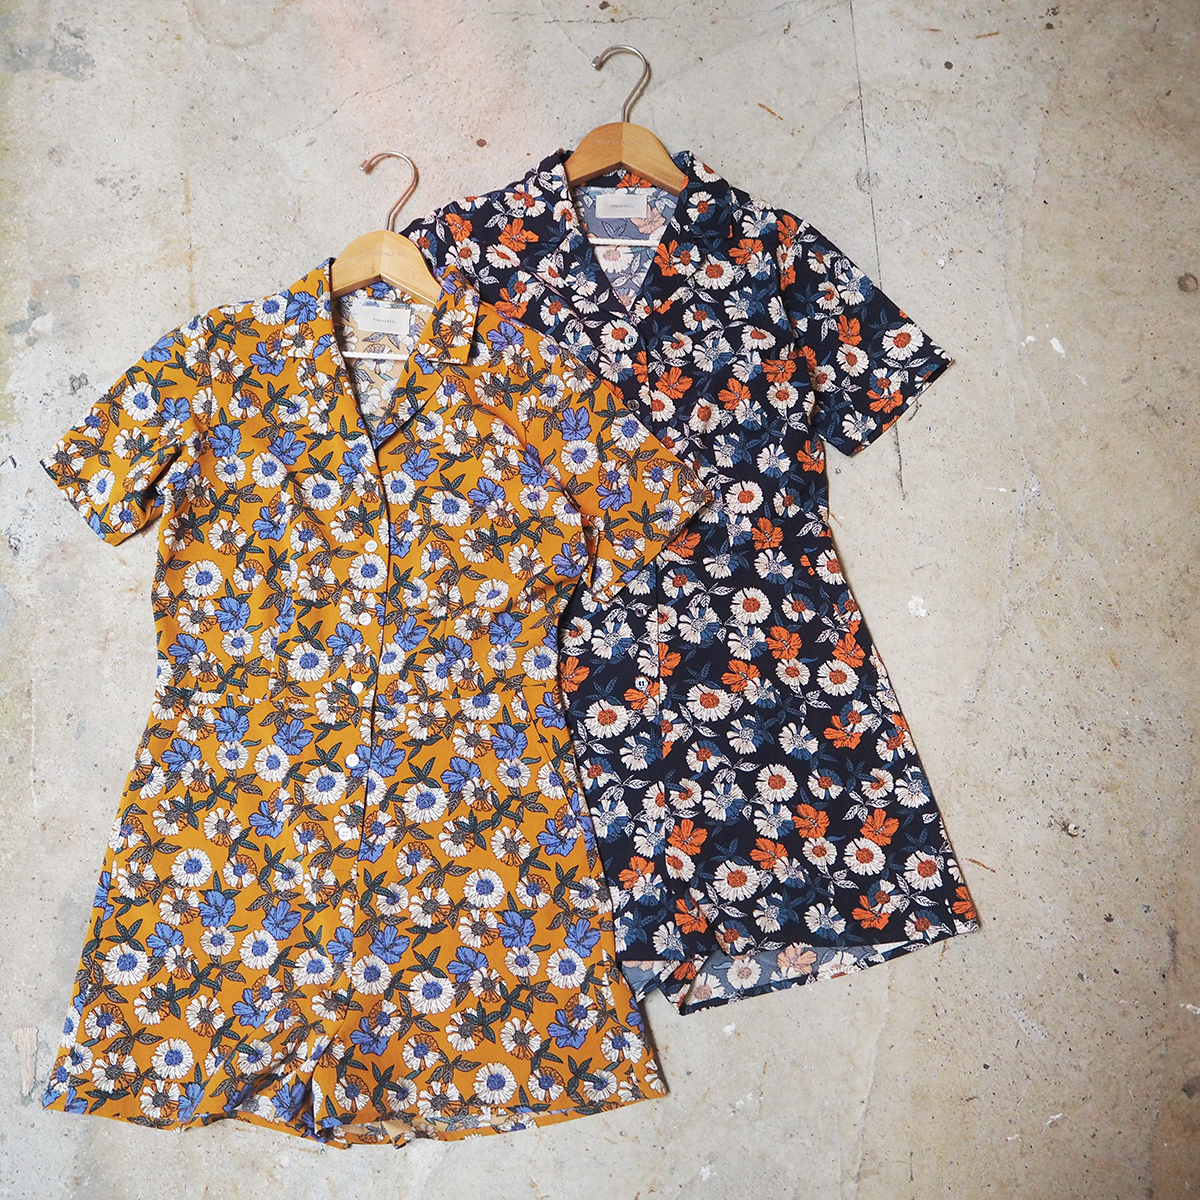 Flower Shirts Combinaison